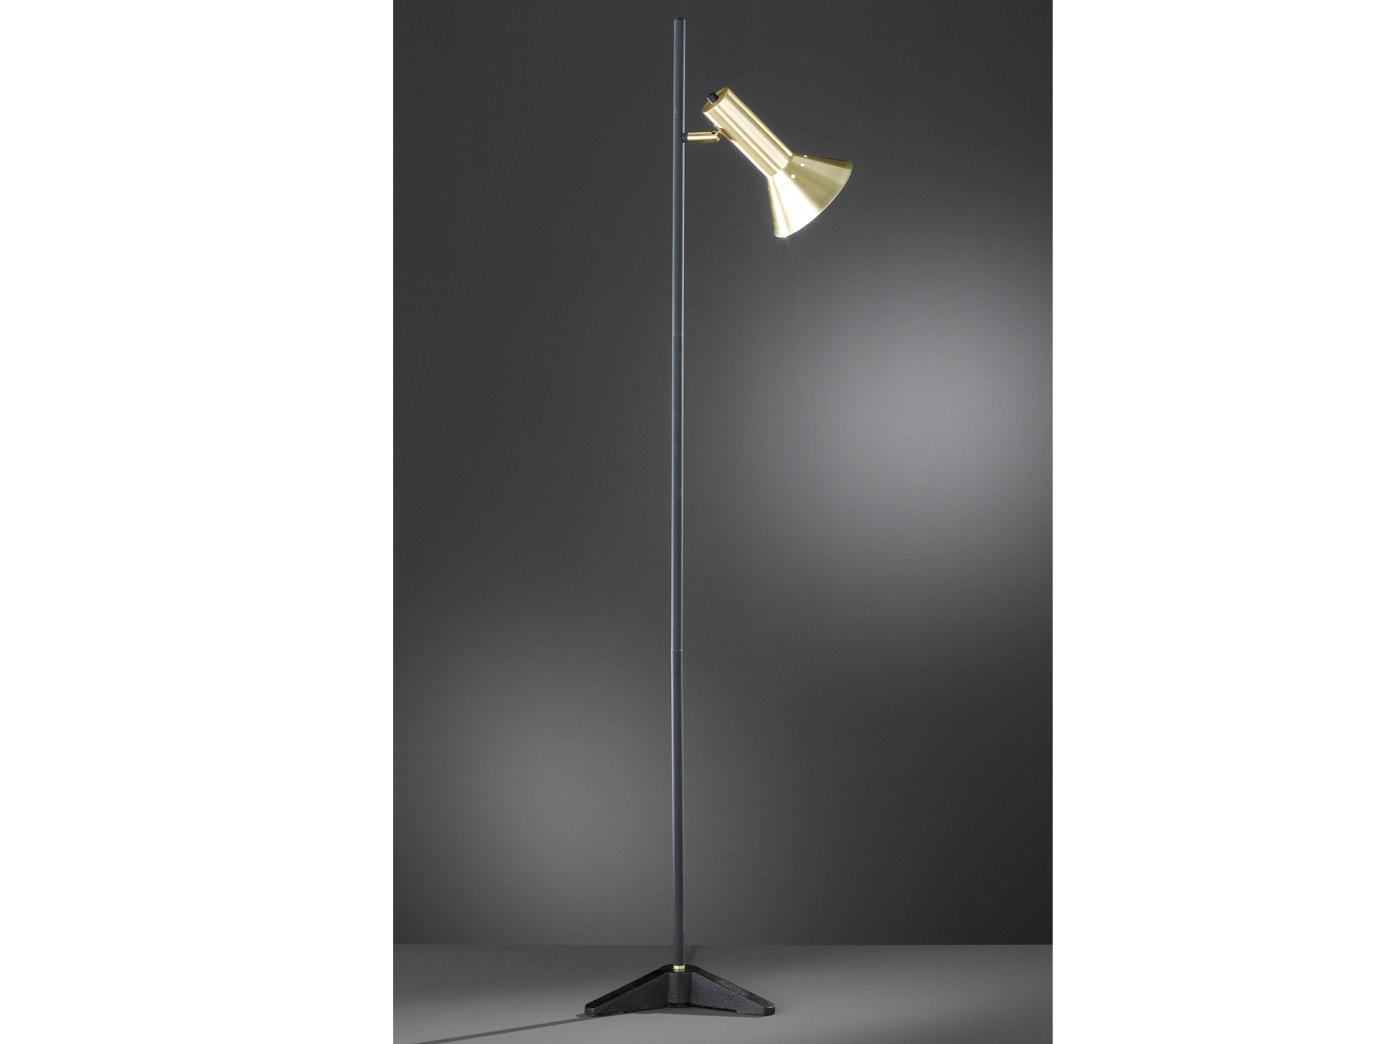 Full Size of Stehlampe Schlafzimmer Leselampe Dimmbar Design Ikea Stehlampen 5c104d6b87fe8 Massivholz Wandbilder Tapeten Loddenkemper Komplett Guenstig Schrank Set Lampe Wohnzimmer Stehlampen Schlafzimmer